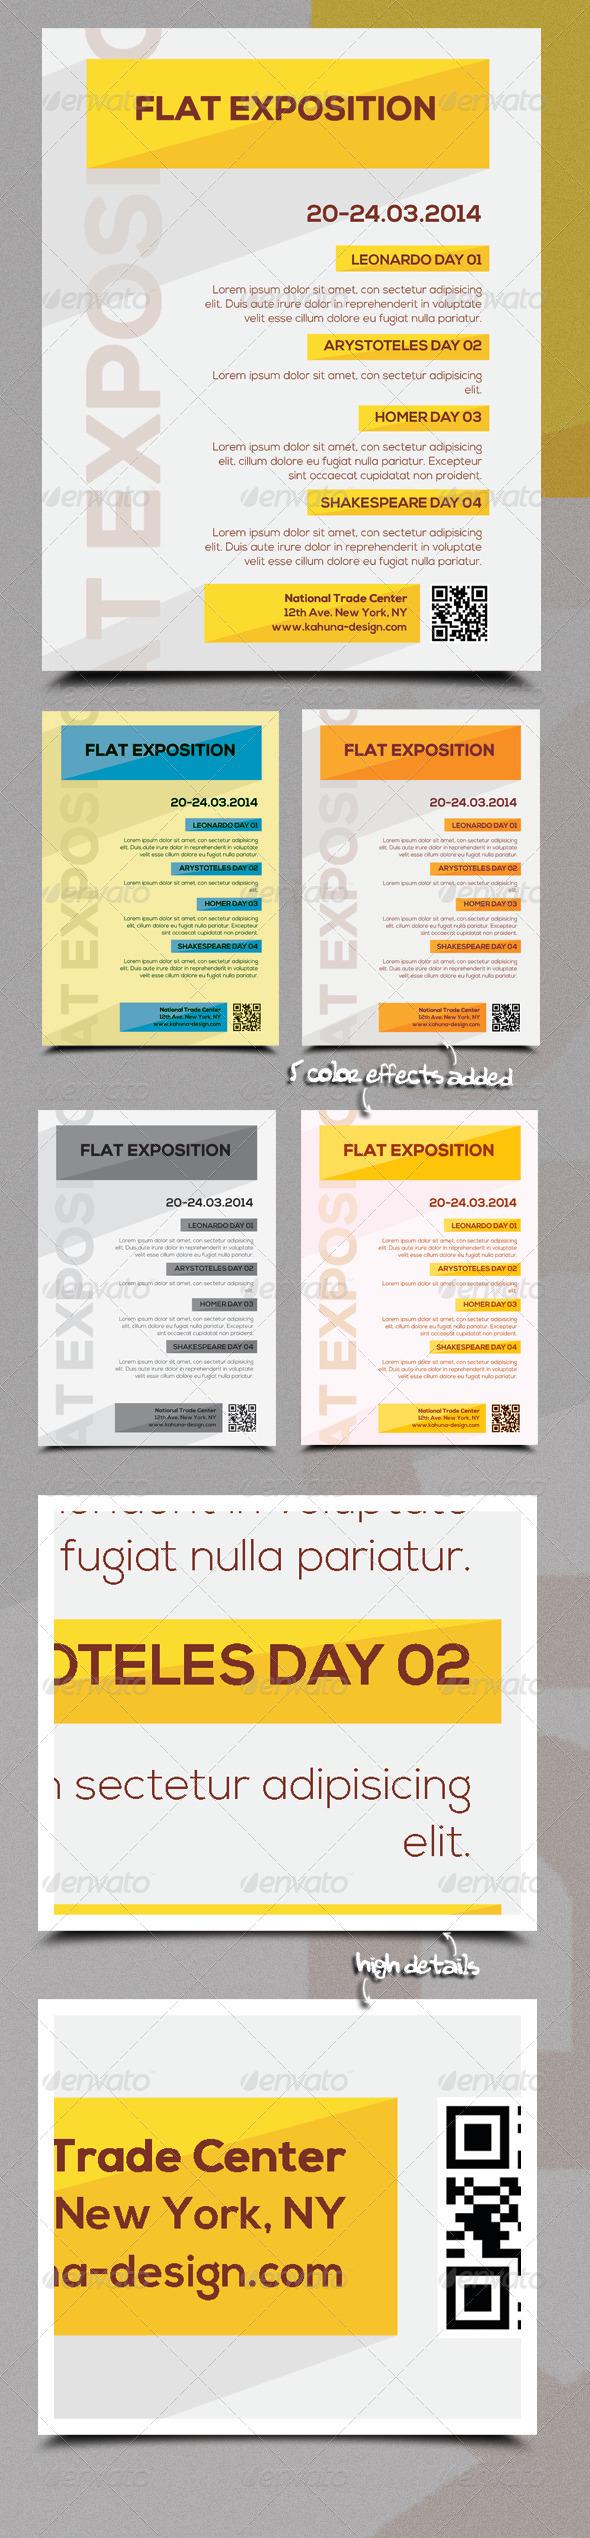 Flat Exposition Poster / Flyer - Flyers Print Templates